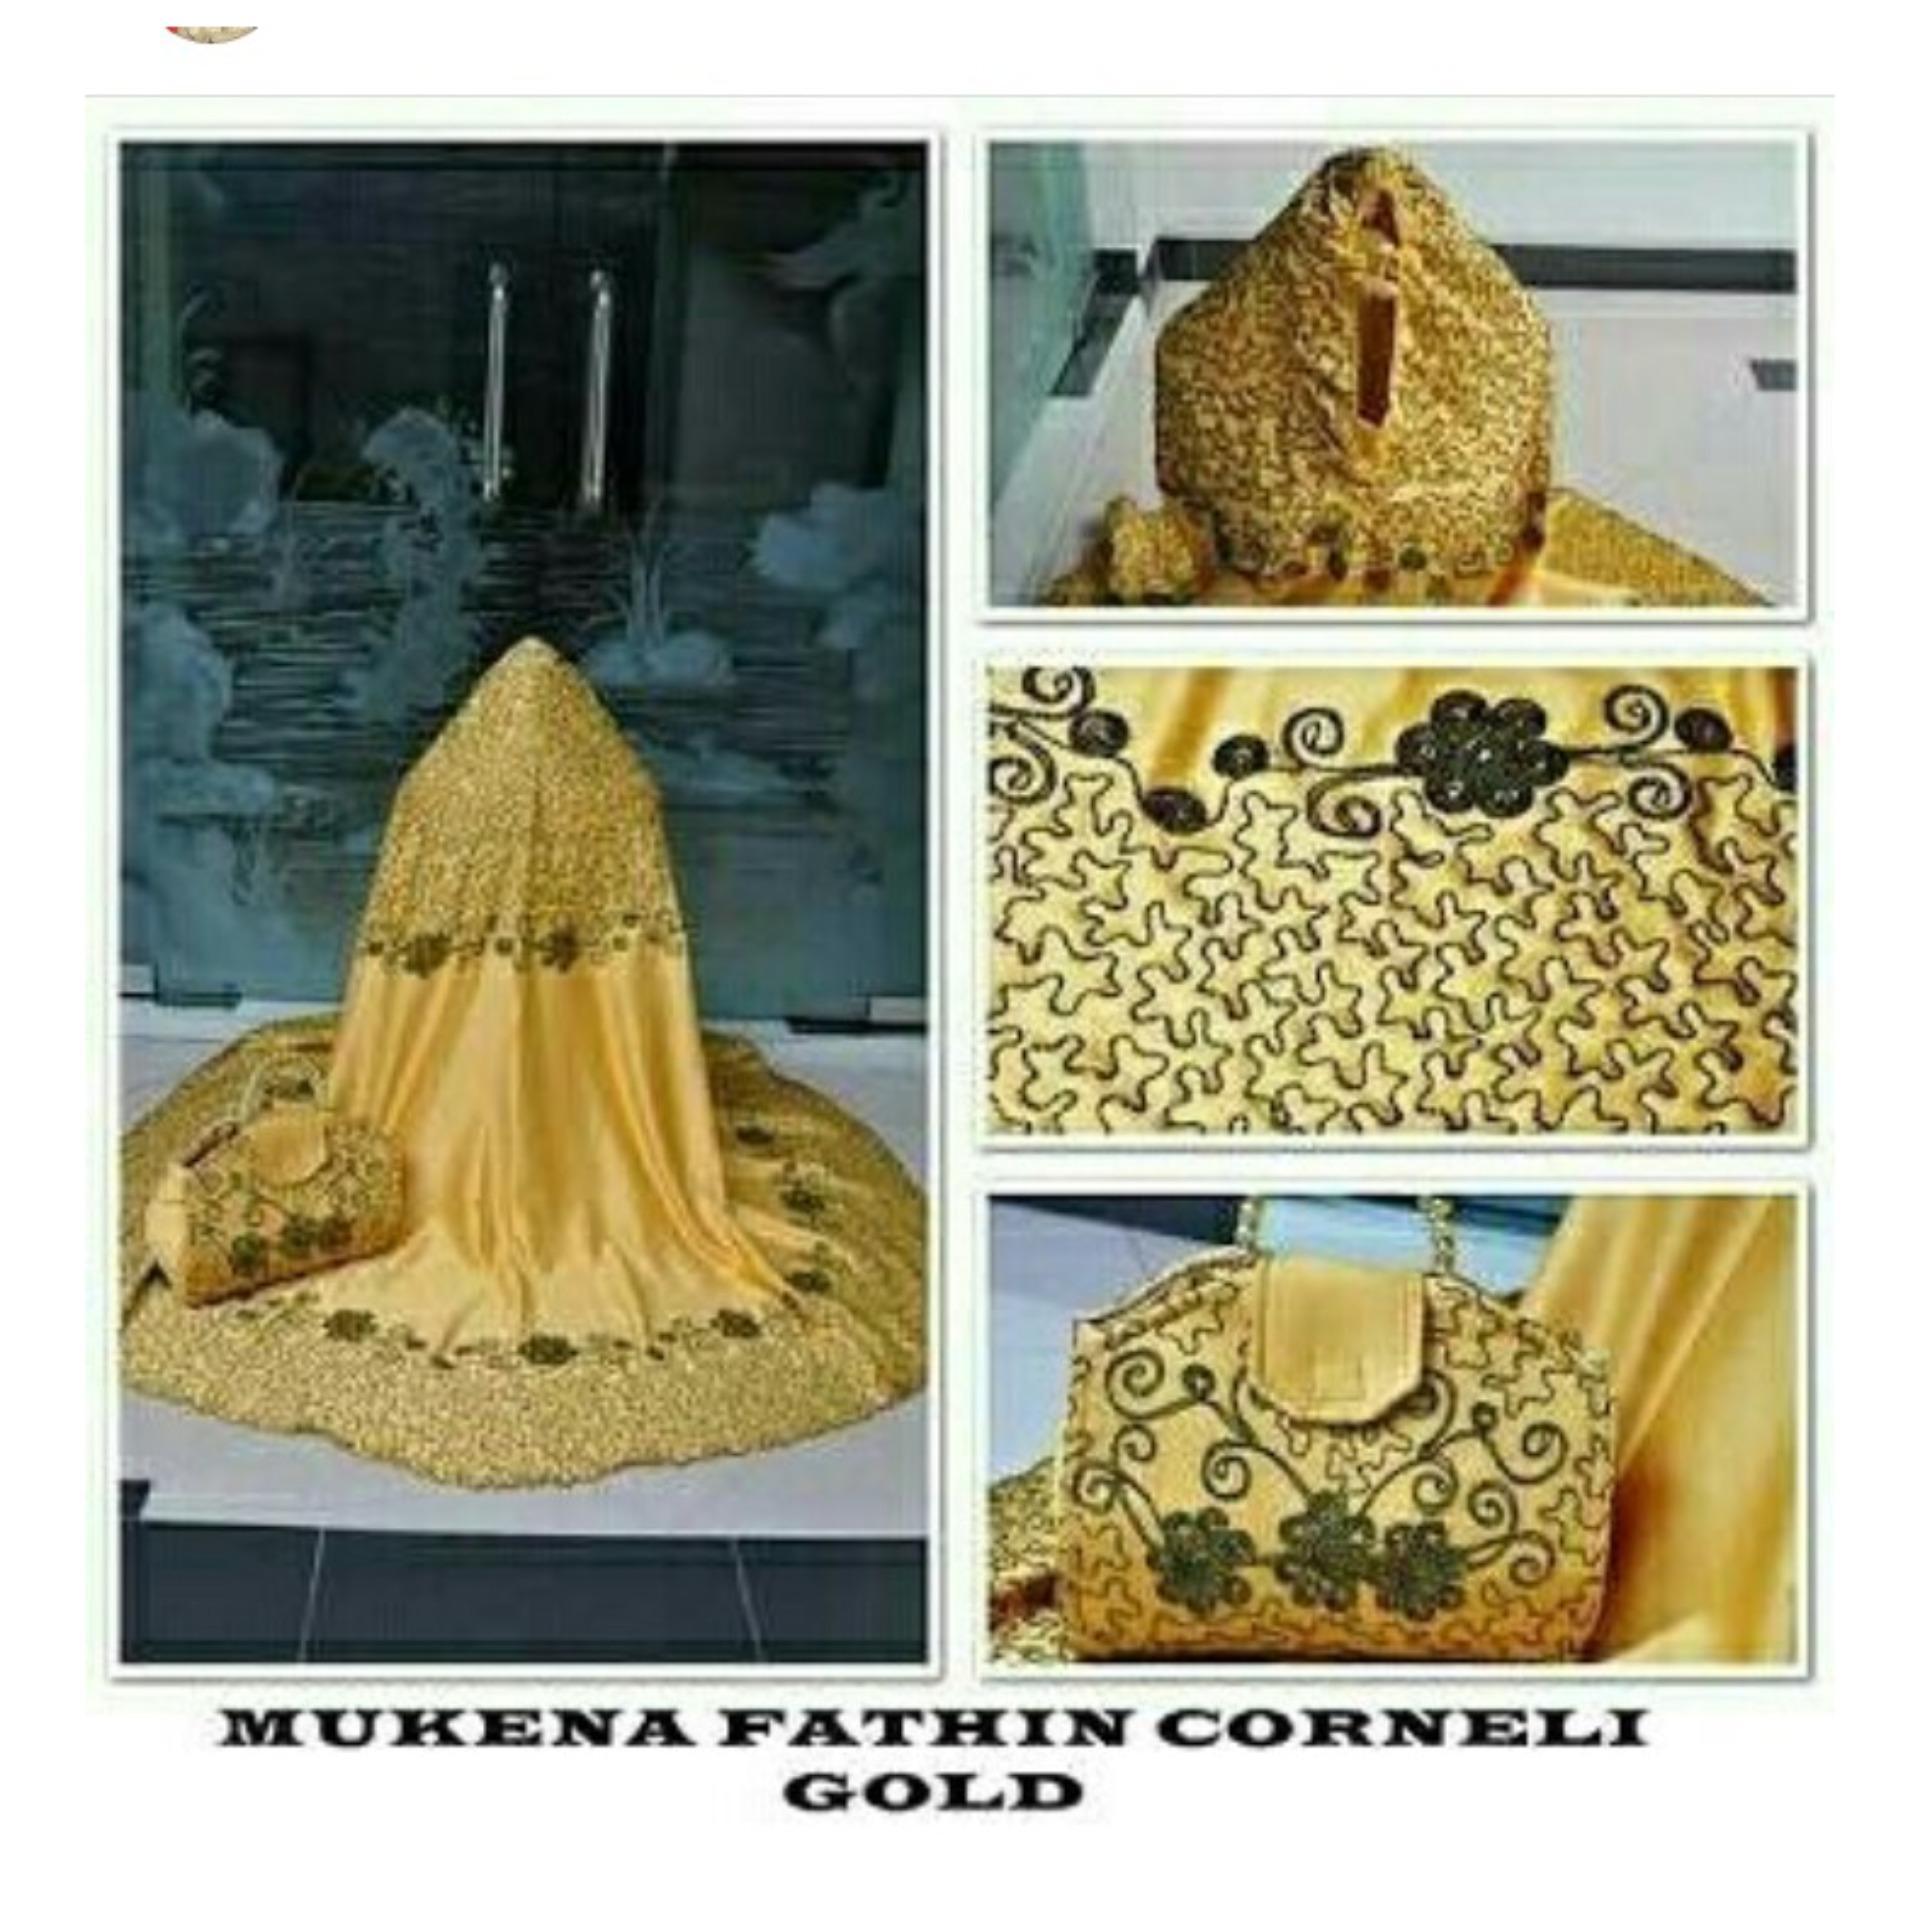 Beli Abangsky Stelan Mukena Fathin Corneli Gold Tas Mutiara Dki Jakarta